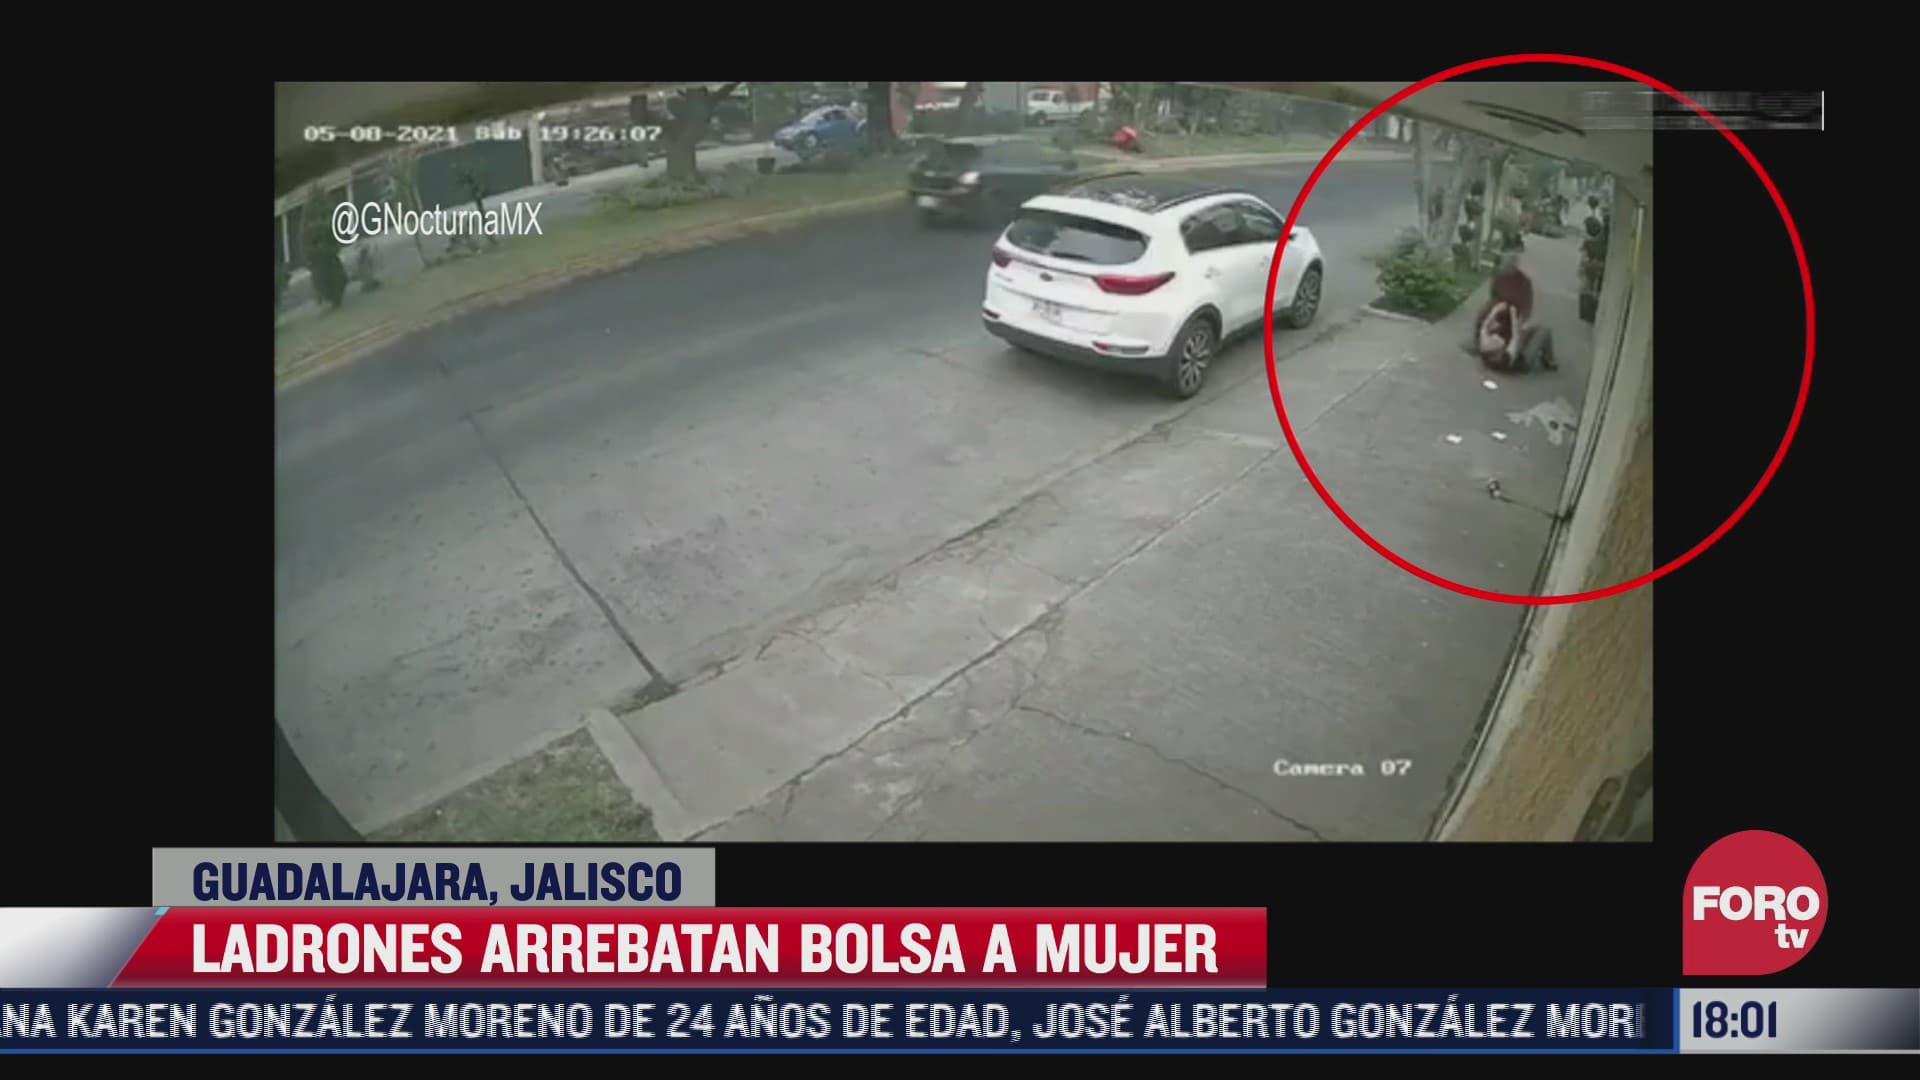 ladrones arrebatan bolsa a mujer en guadalajara jalisco